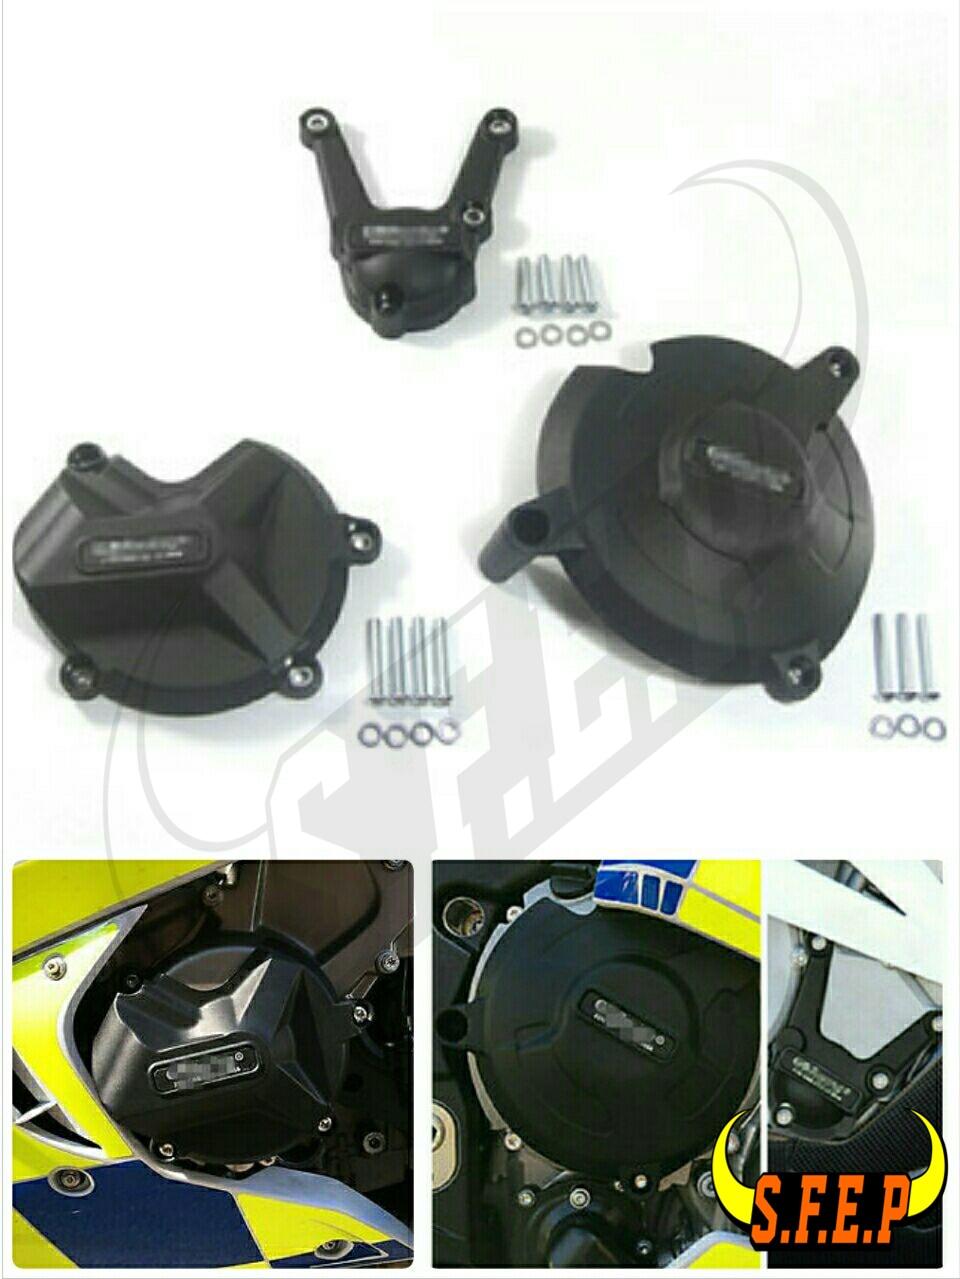 Motorrad Motor Fall Schutz Schutz Abdeckung Gb Racing Fur Bmw S1000r